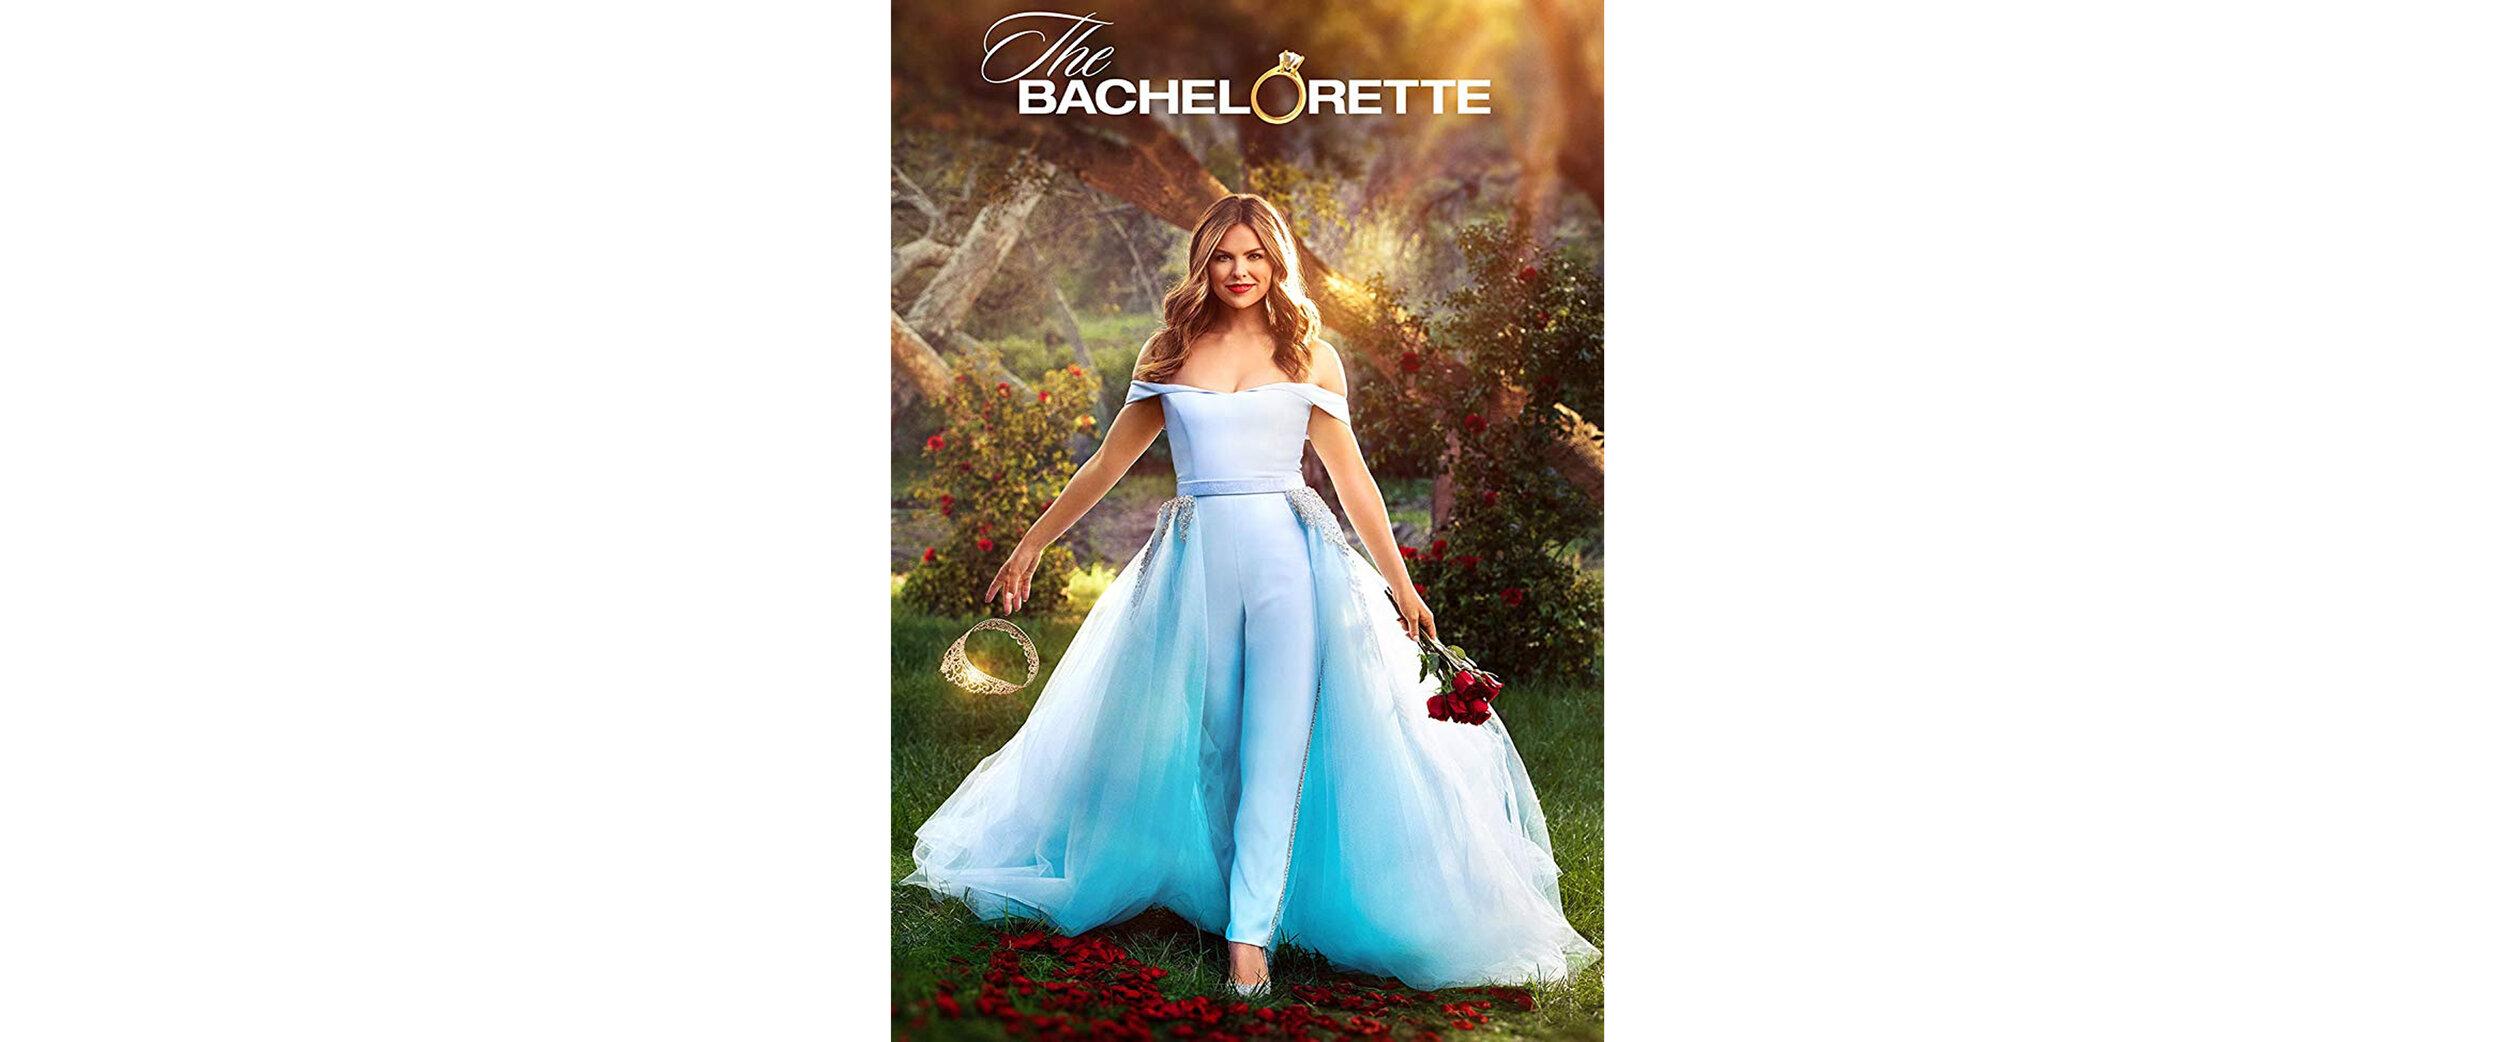 Bachelorette15_3.jpg